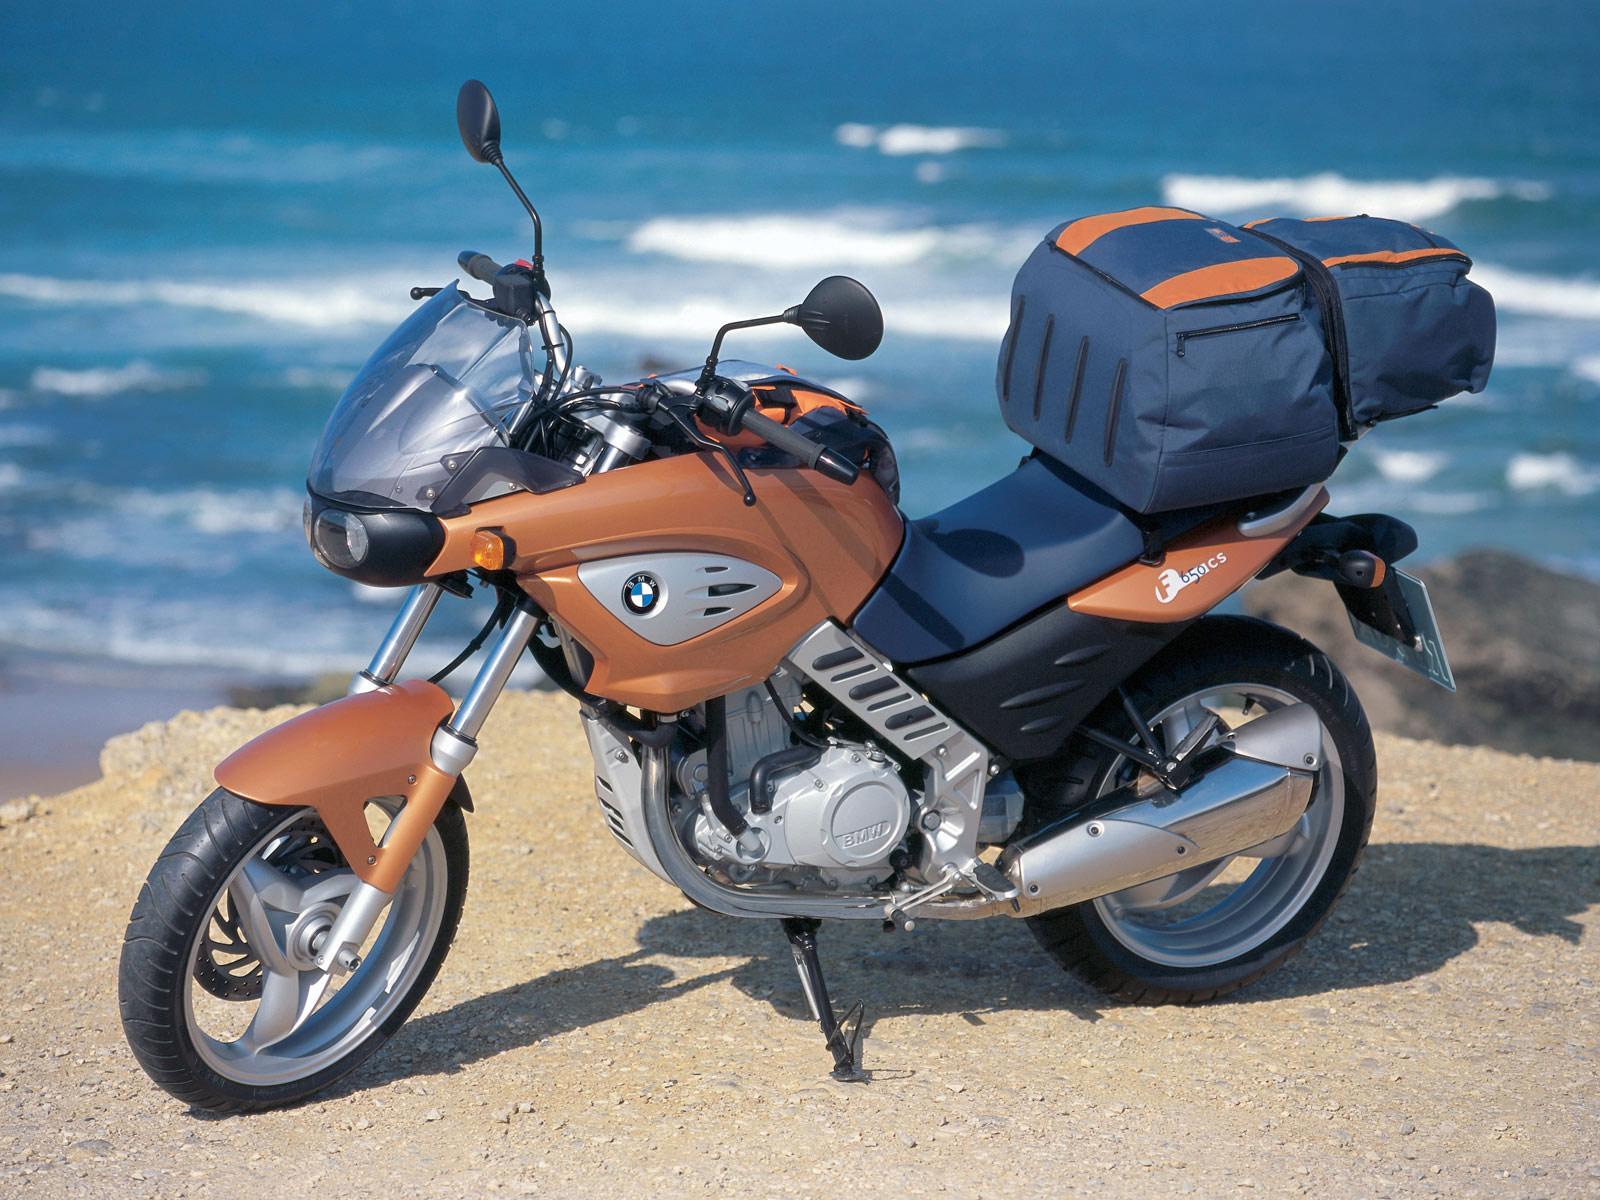 http://4.bp.blogspot.com/-GCJ2Dv9O9wI/Th7fWfK4viI/AAAAAAAAAHw/hnFmLV1W7kU/s1600/BMW_F650CS_BMW-motorcycle-desktop-wallpapers_2001_3.jpg